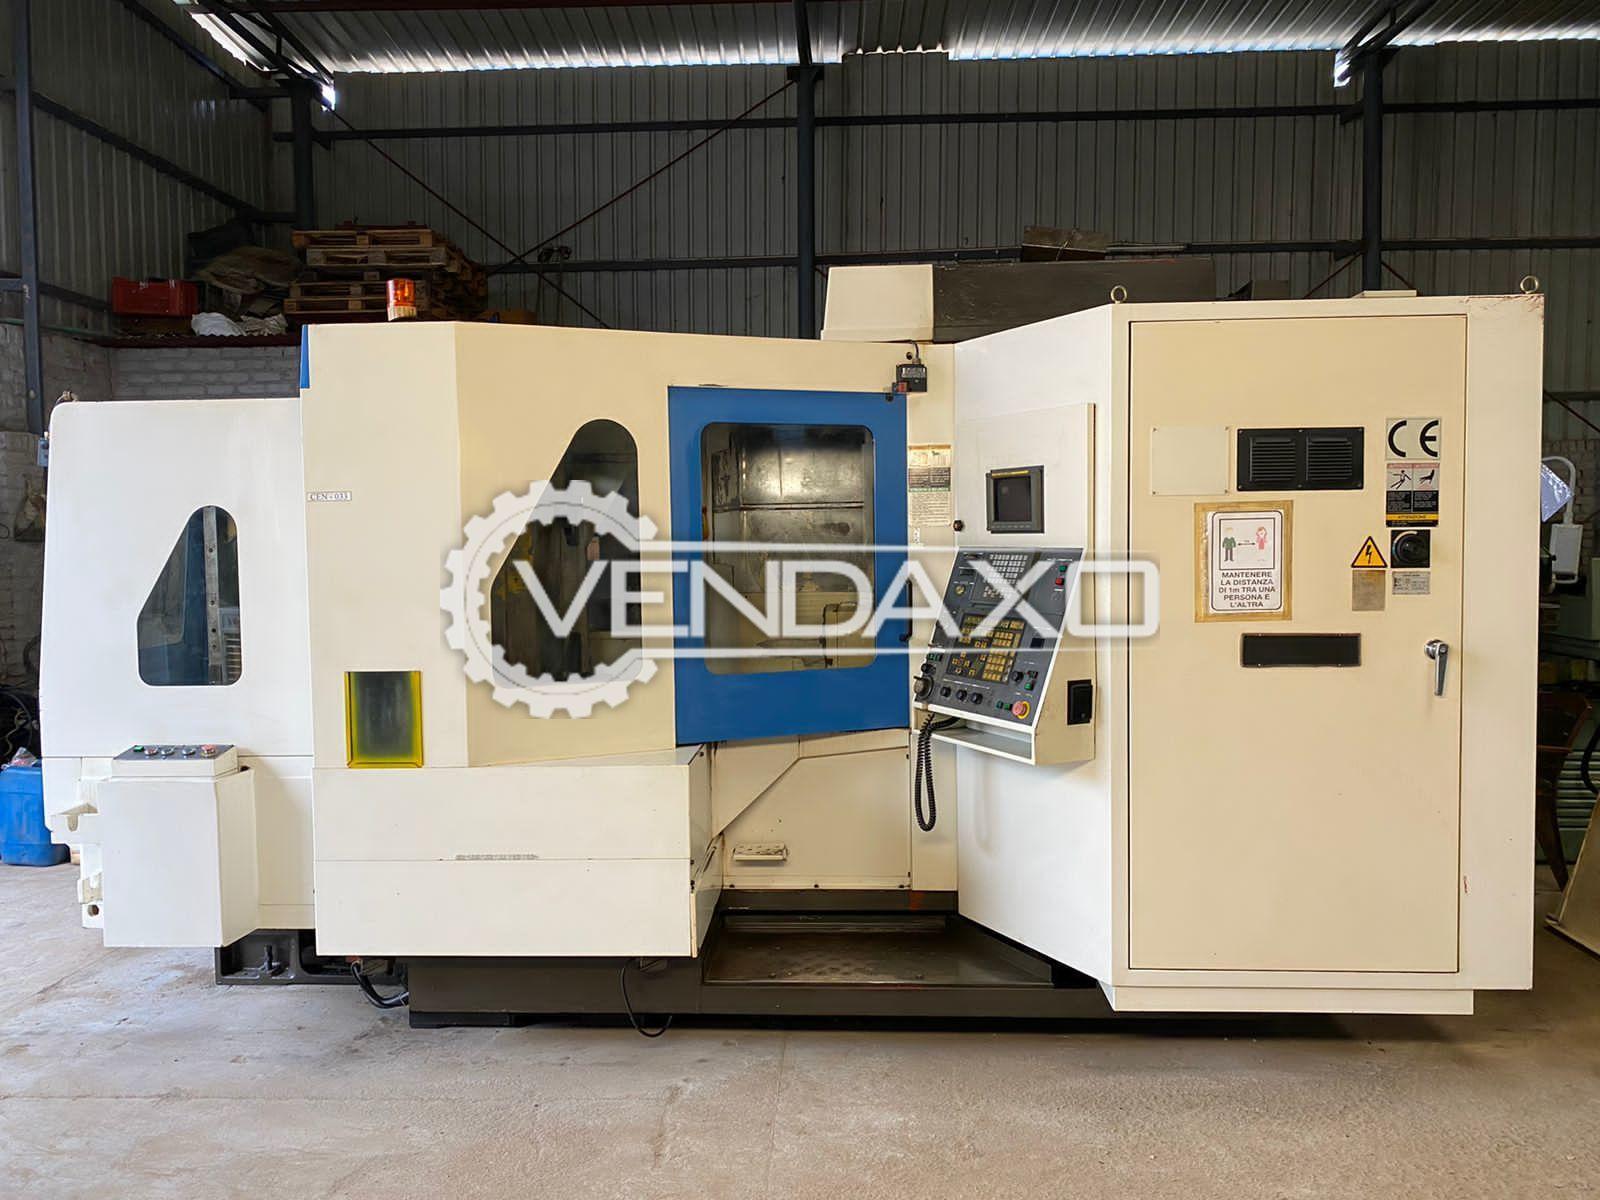 Kia H50 CNC Horizontal Machining Center HMC - Pallet Size - 500 x 500 mm